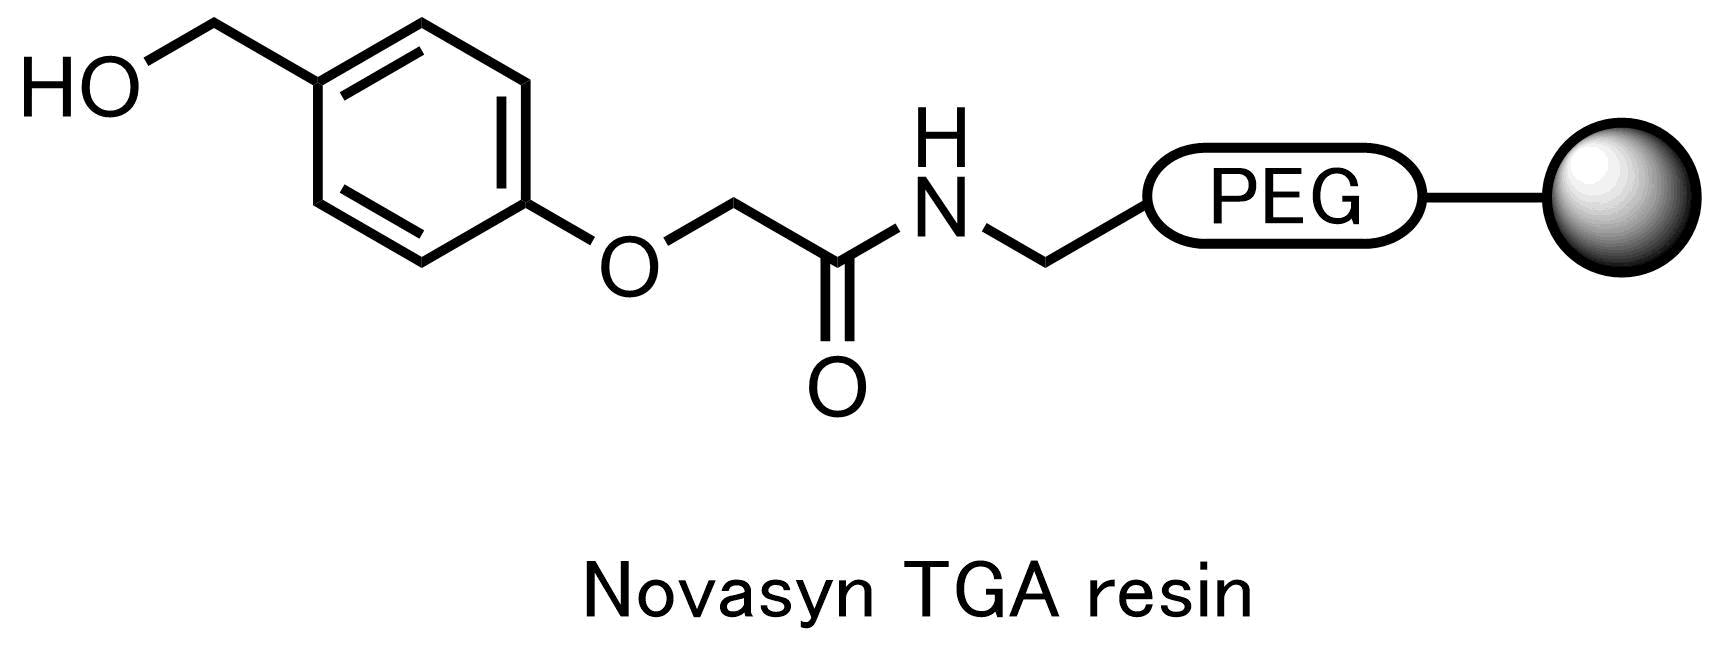 Novasyn TGA resin